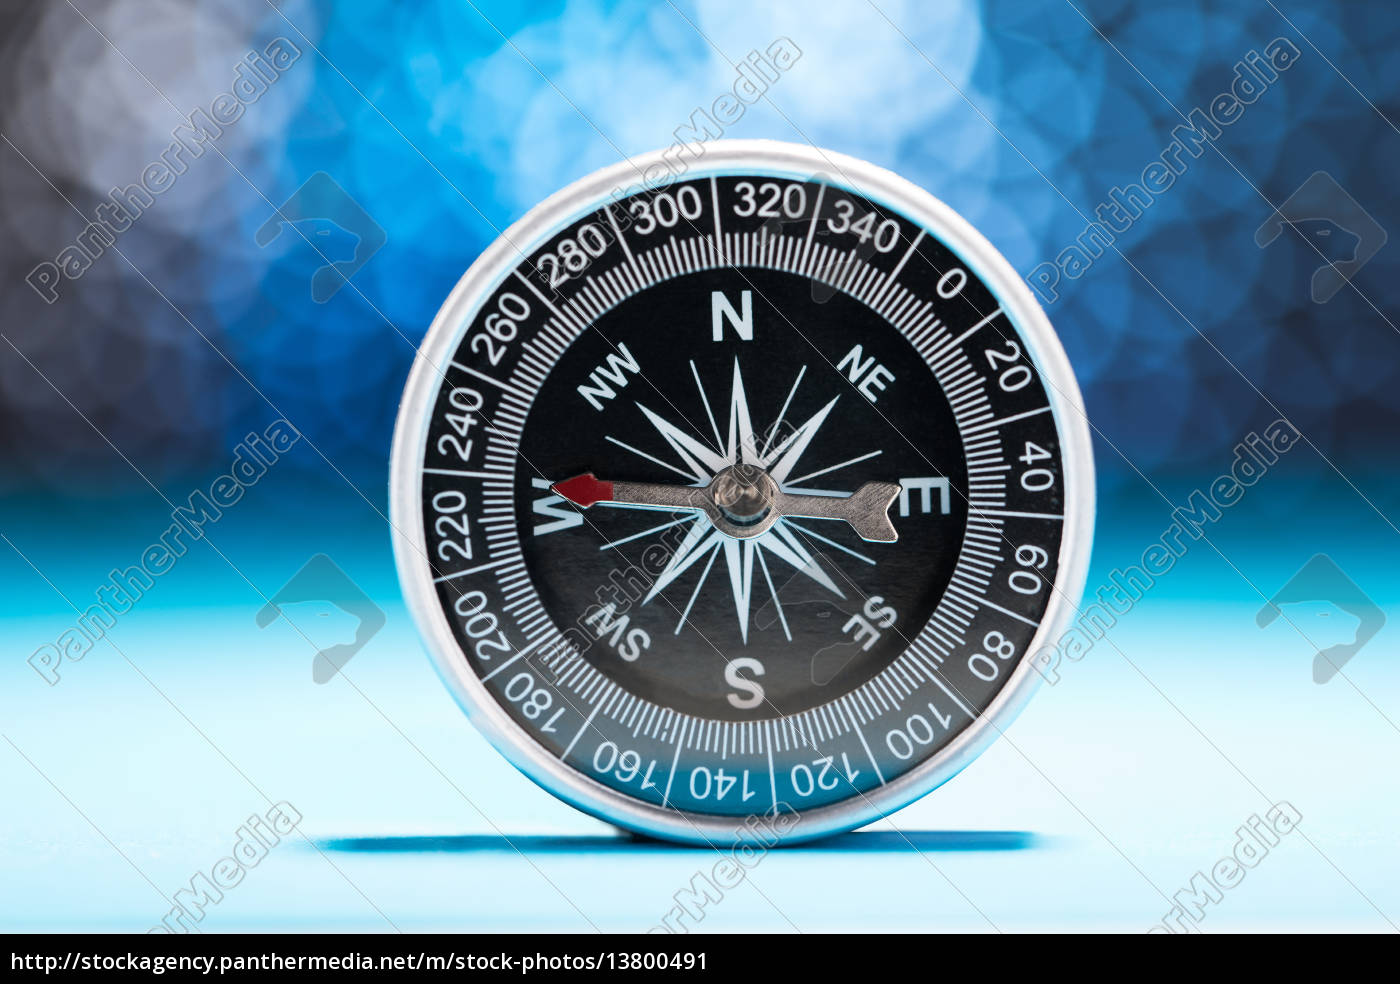 metal, compass - 13800491